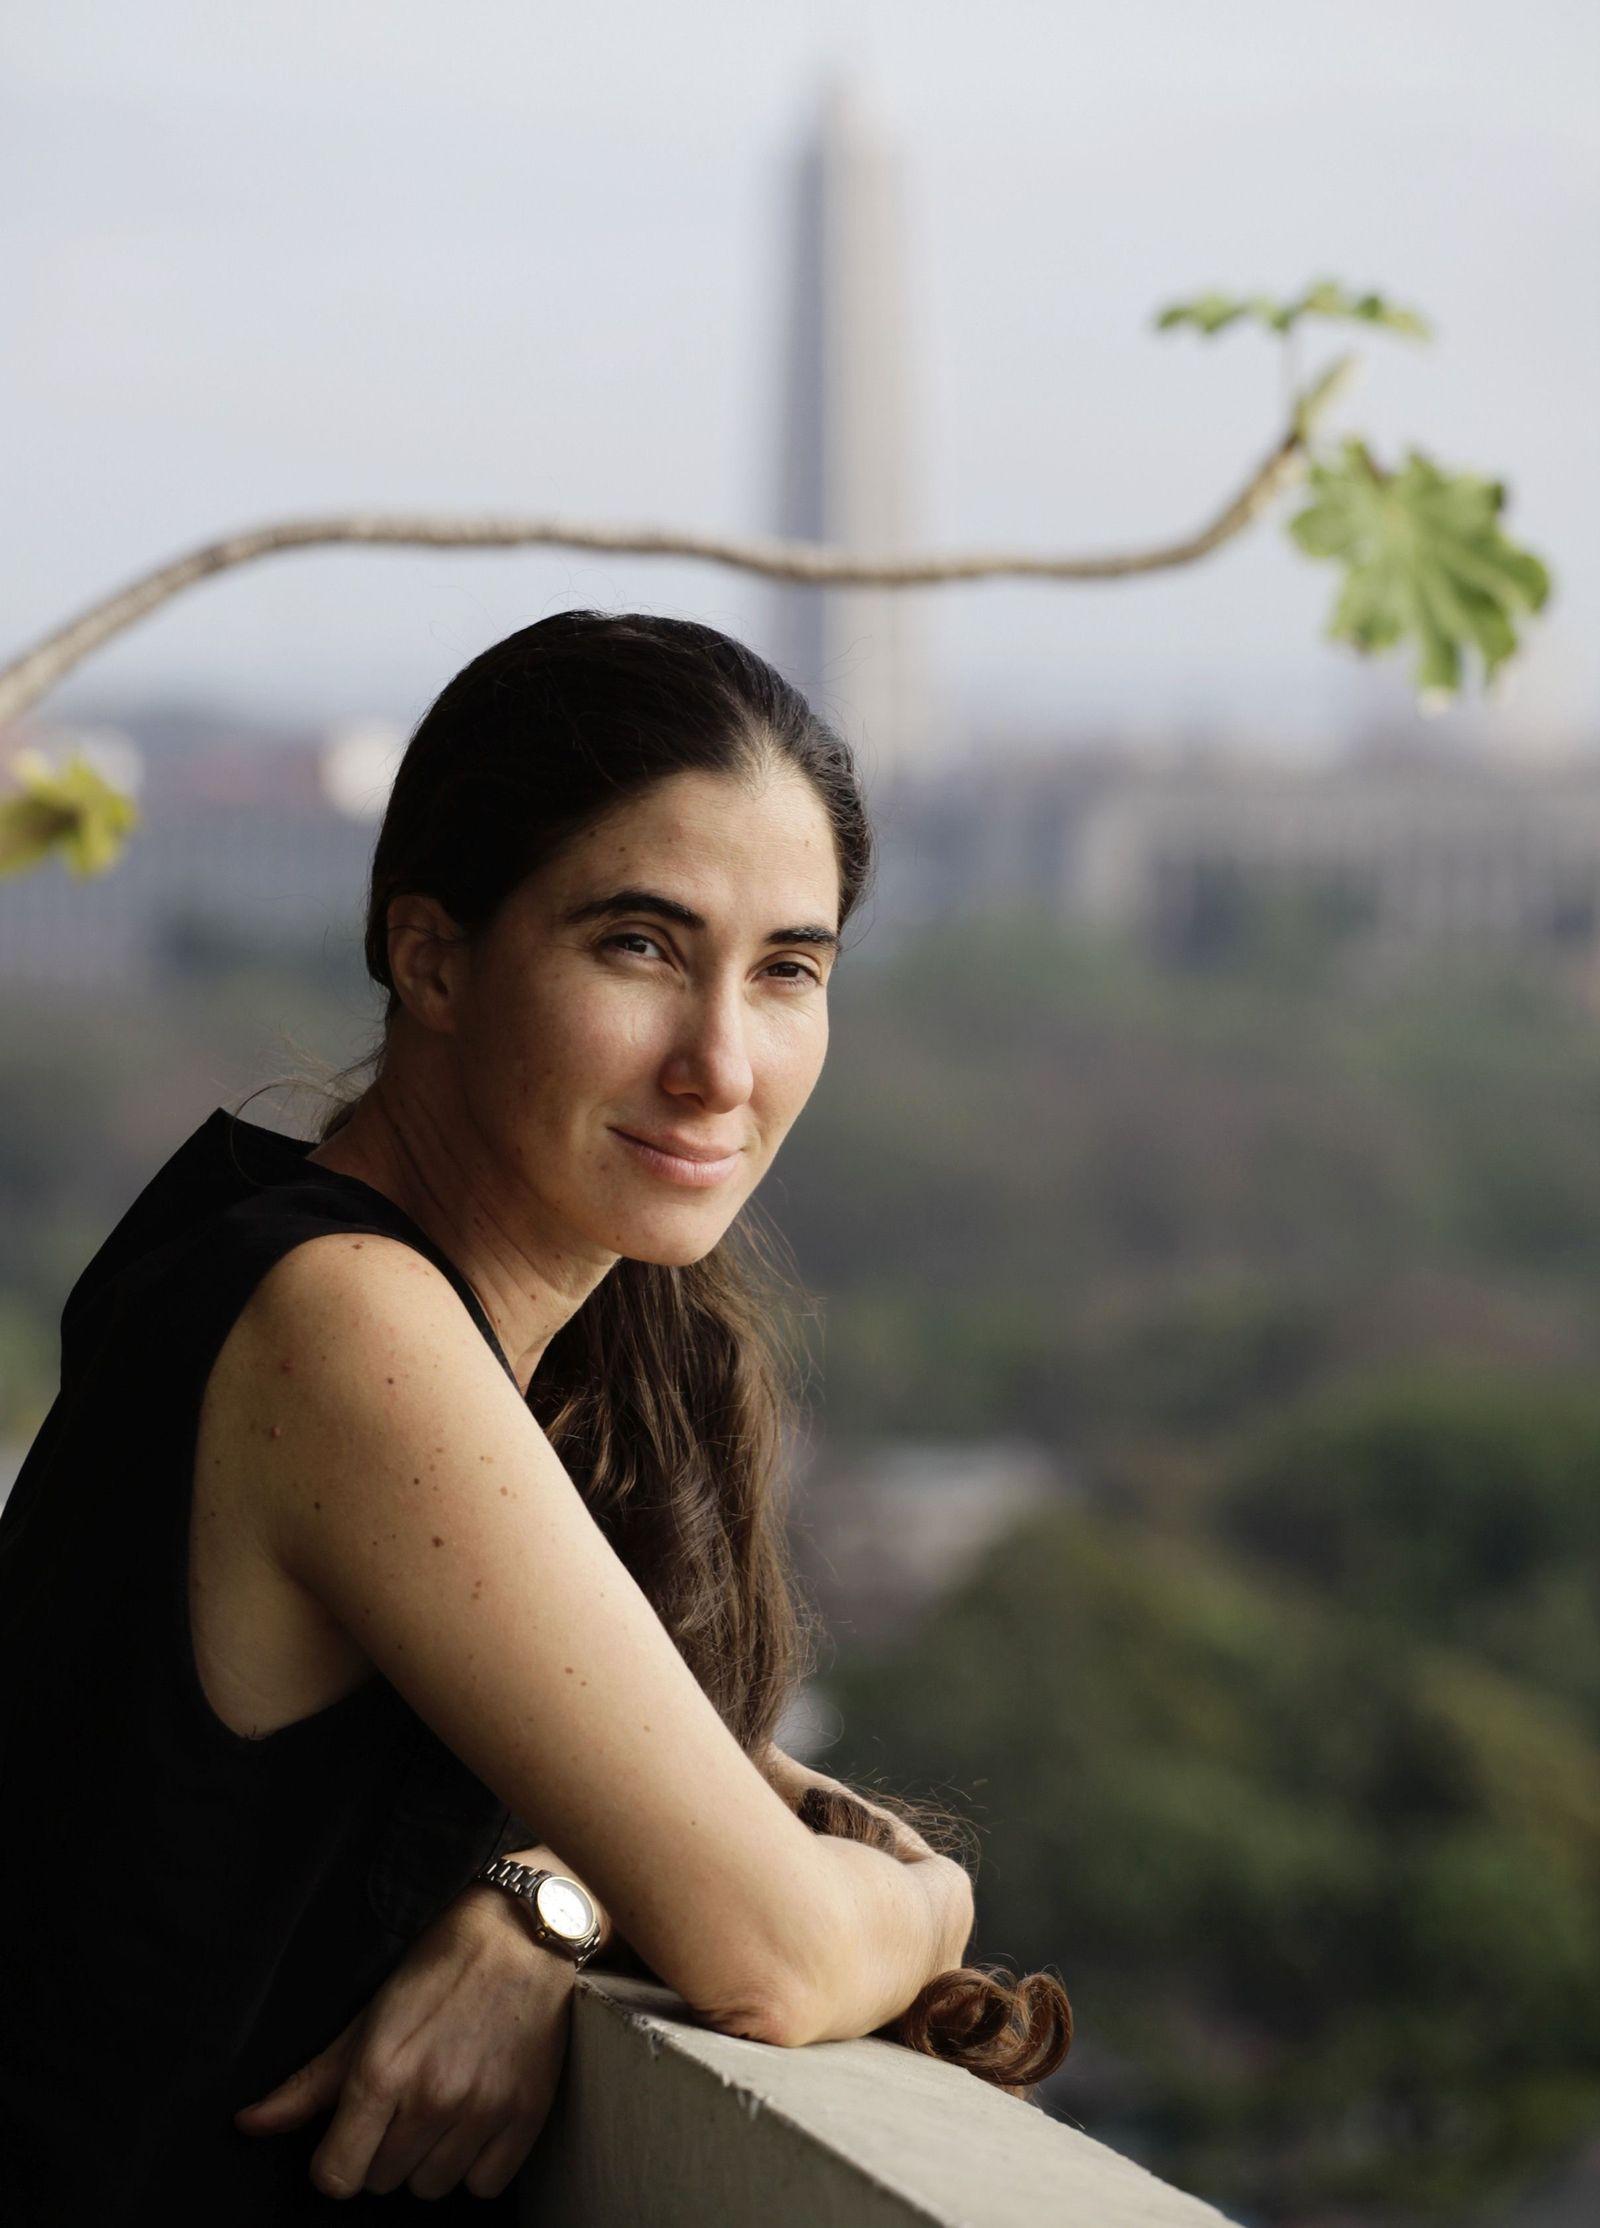 Yoani Sanchez / Bloggerin / Kuba